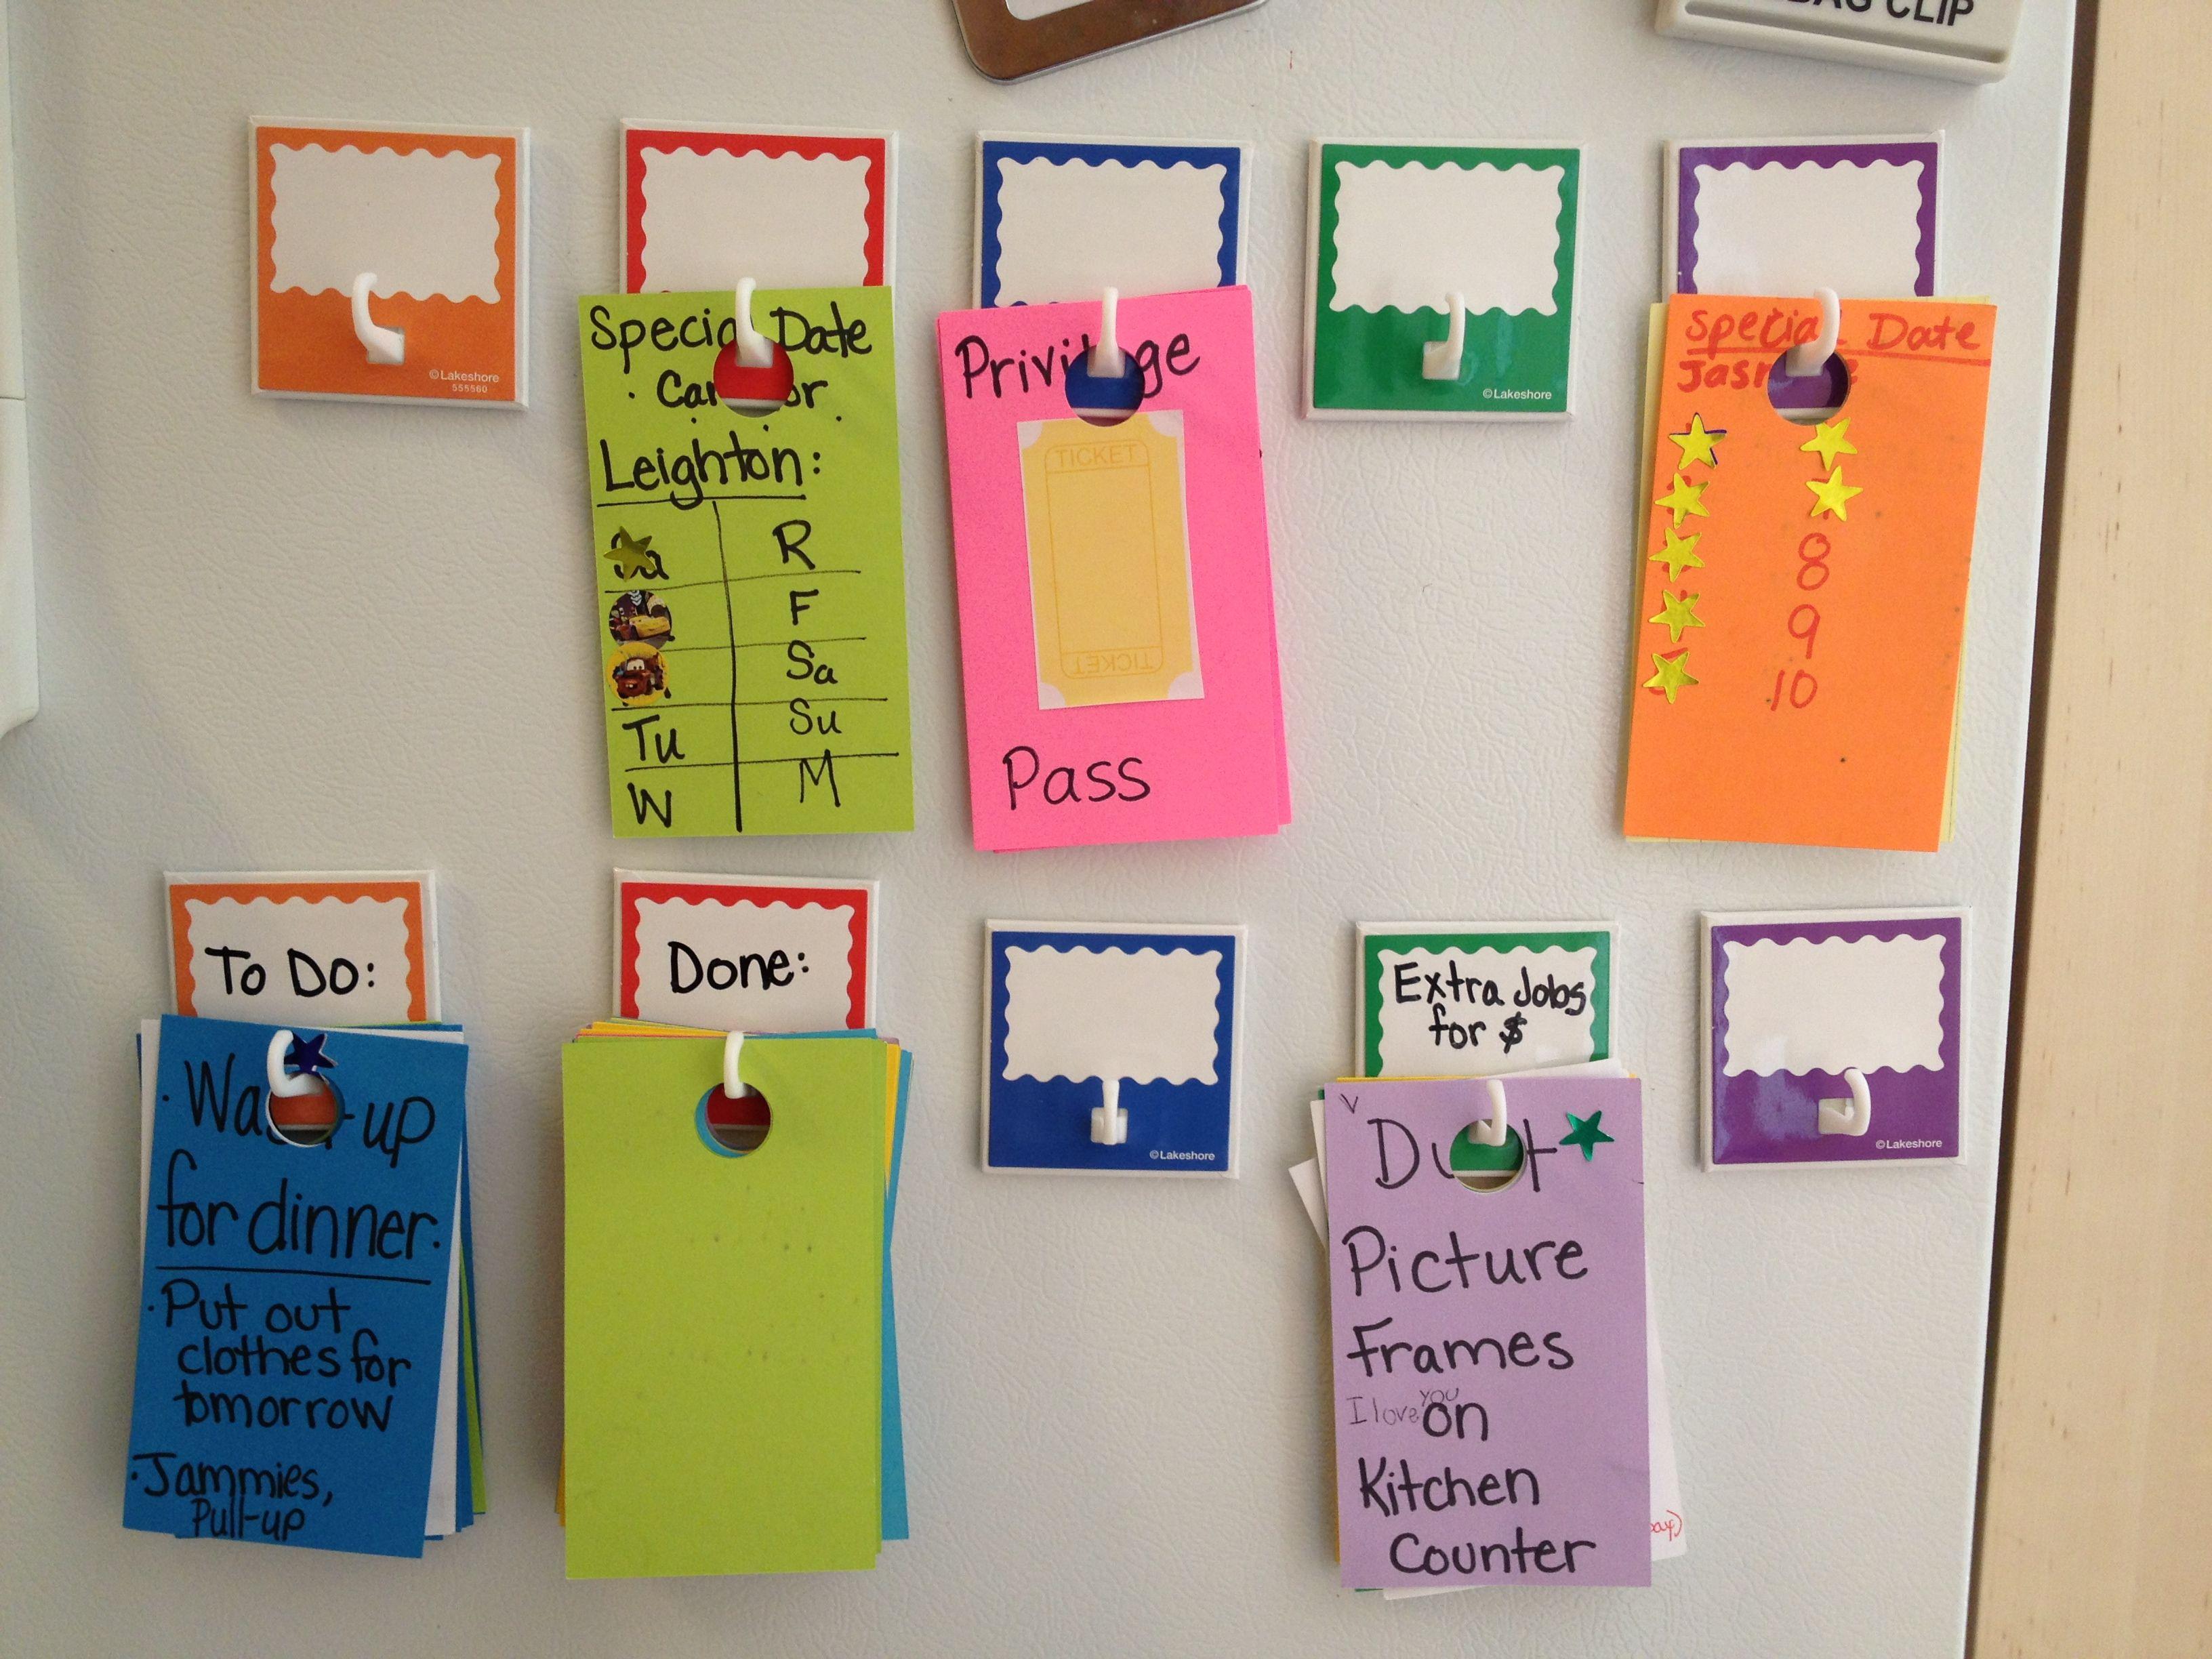 54 Best Kids: Chore Charts Images On Pinterest | Chore Ideas, Kid